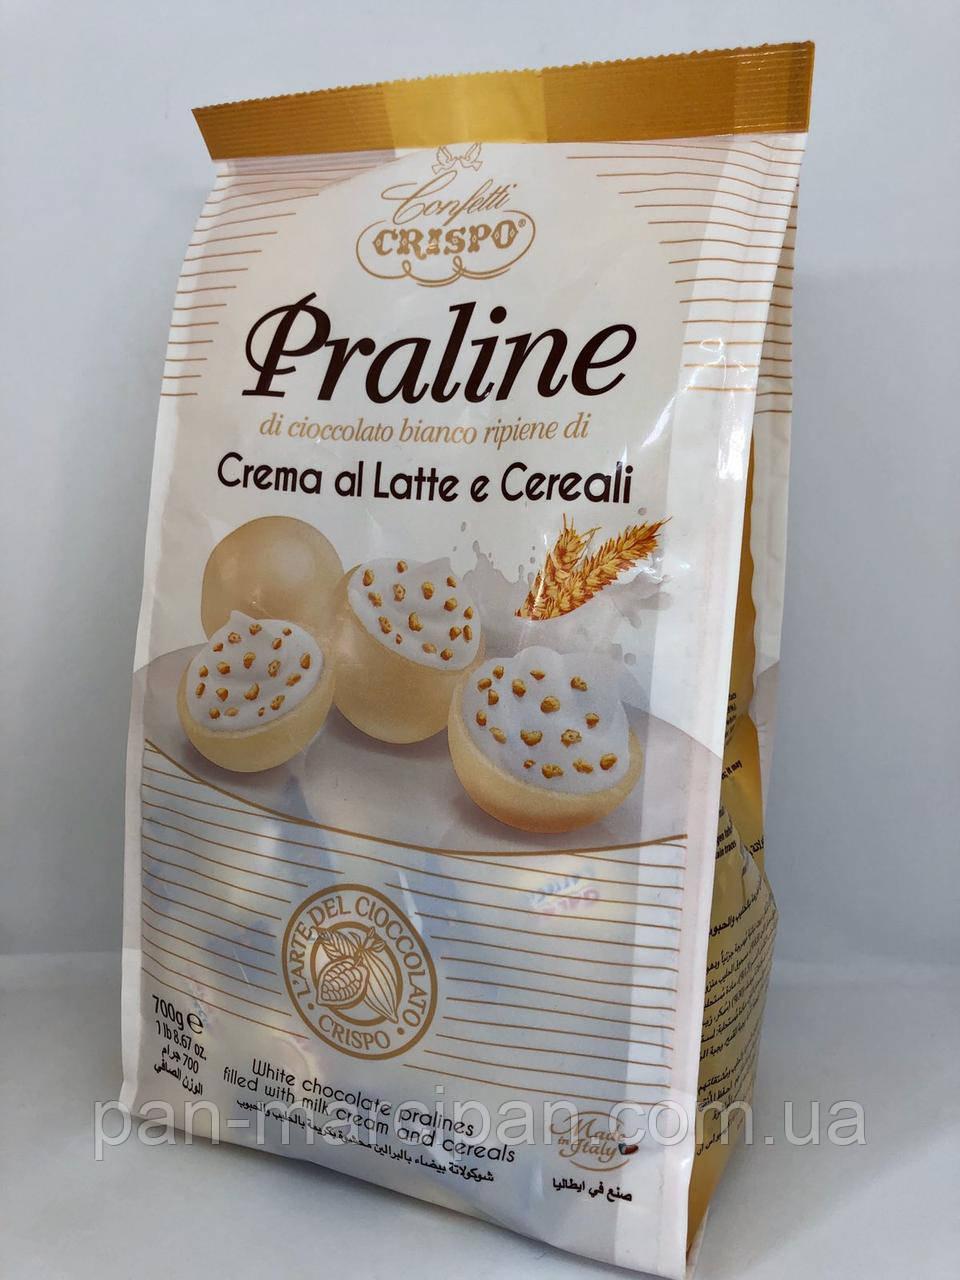 Цукерки Crispo Praline Crema al Latte e Cereali 700 г Італія